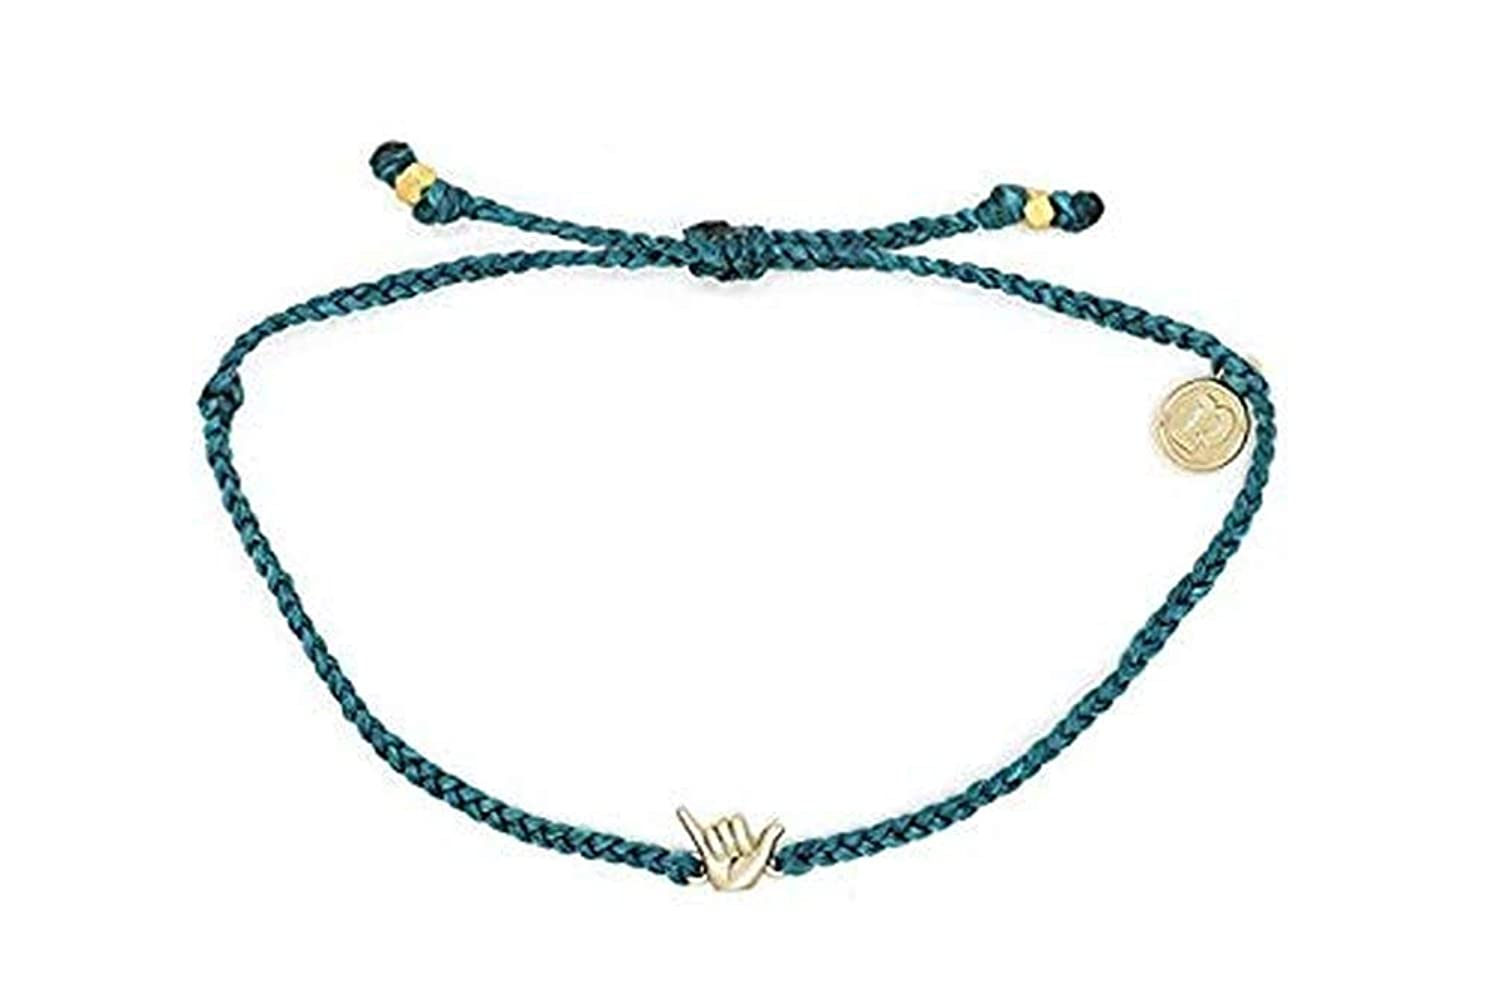 Pura Vida Gold Shaka Bracelet - Gold-Plated Charm, Adjustable Band - 100% Waterproof